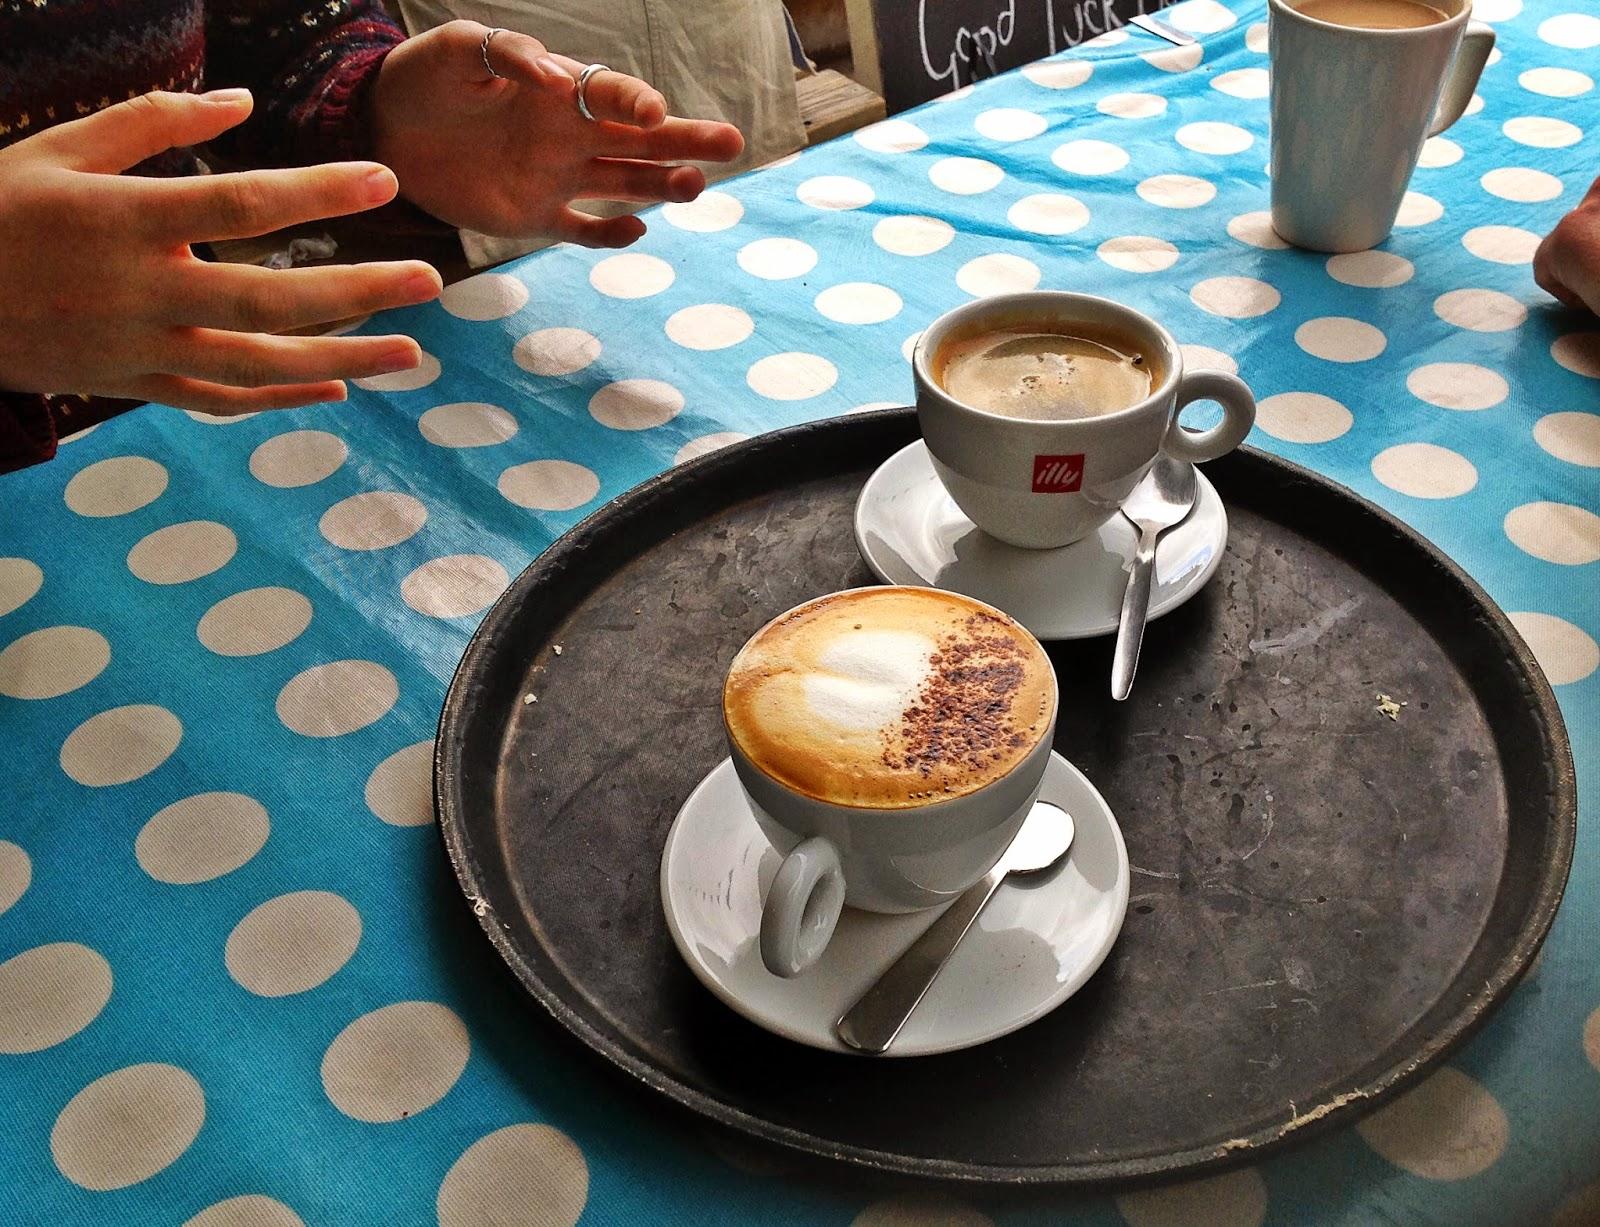 coffee%2Bat%2Bpig%2Band%2Bpastry.jpg